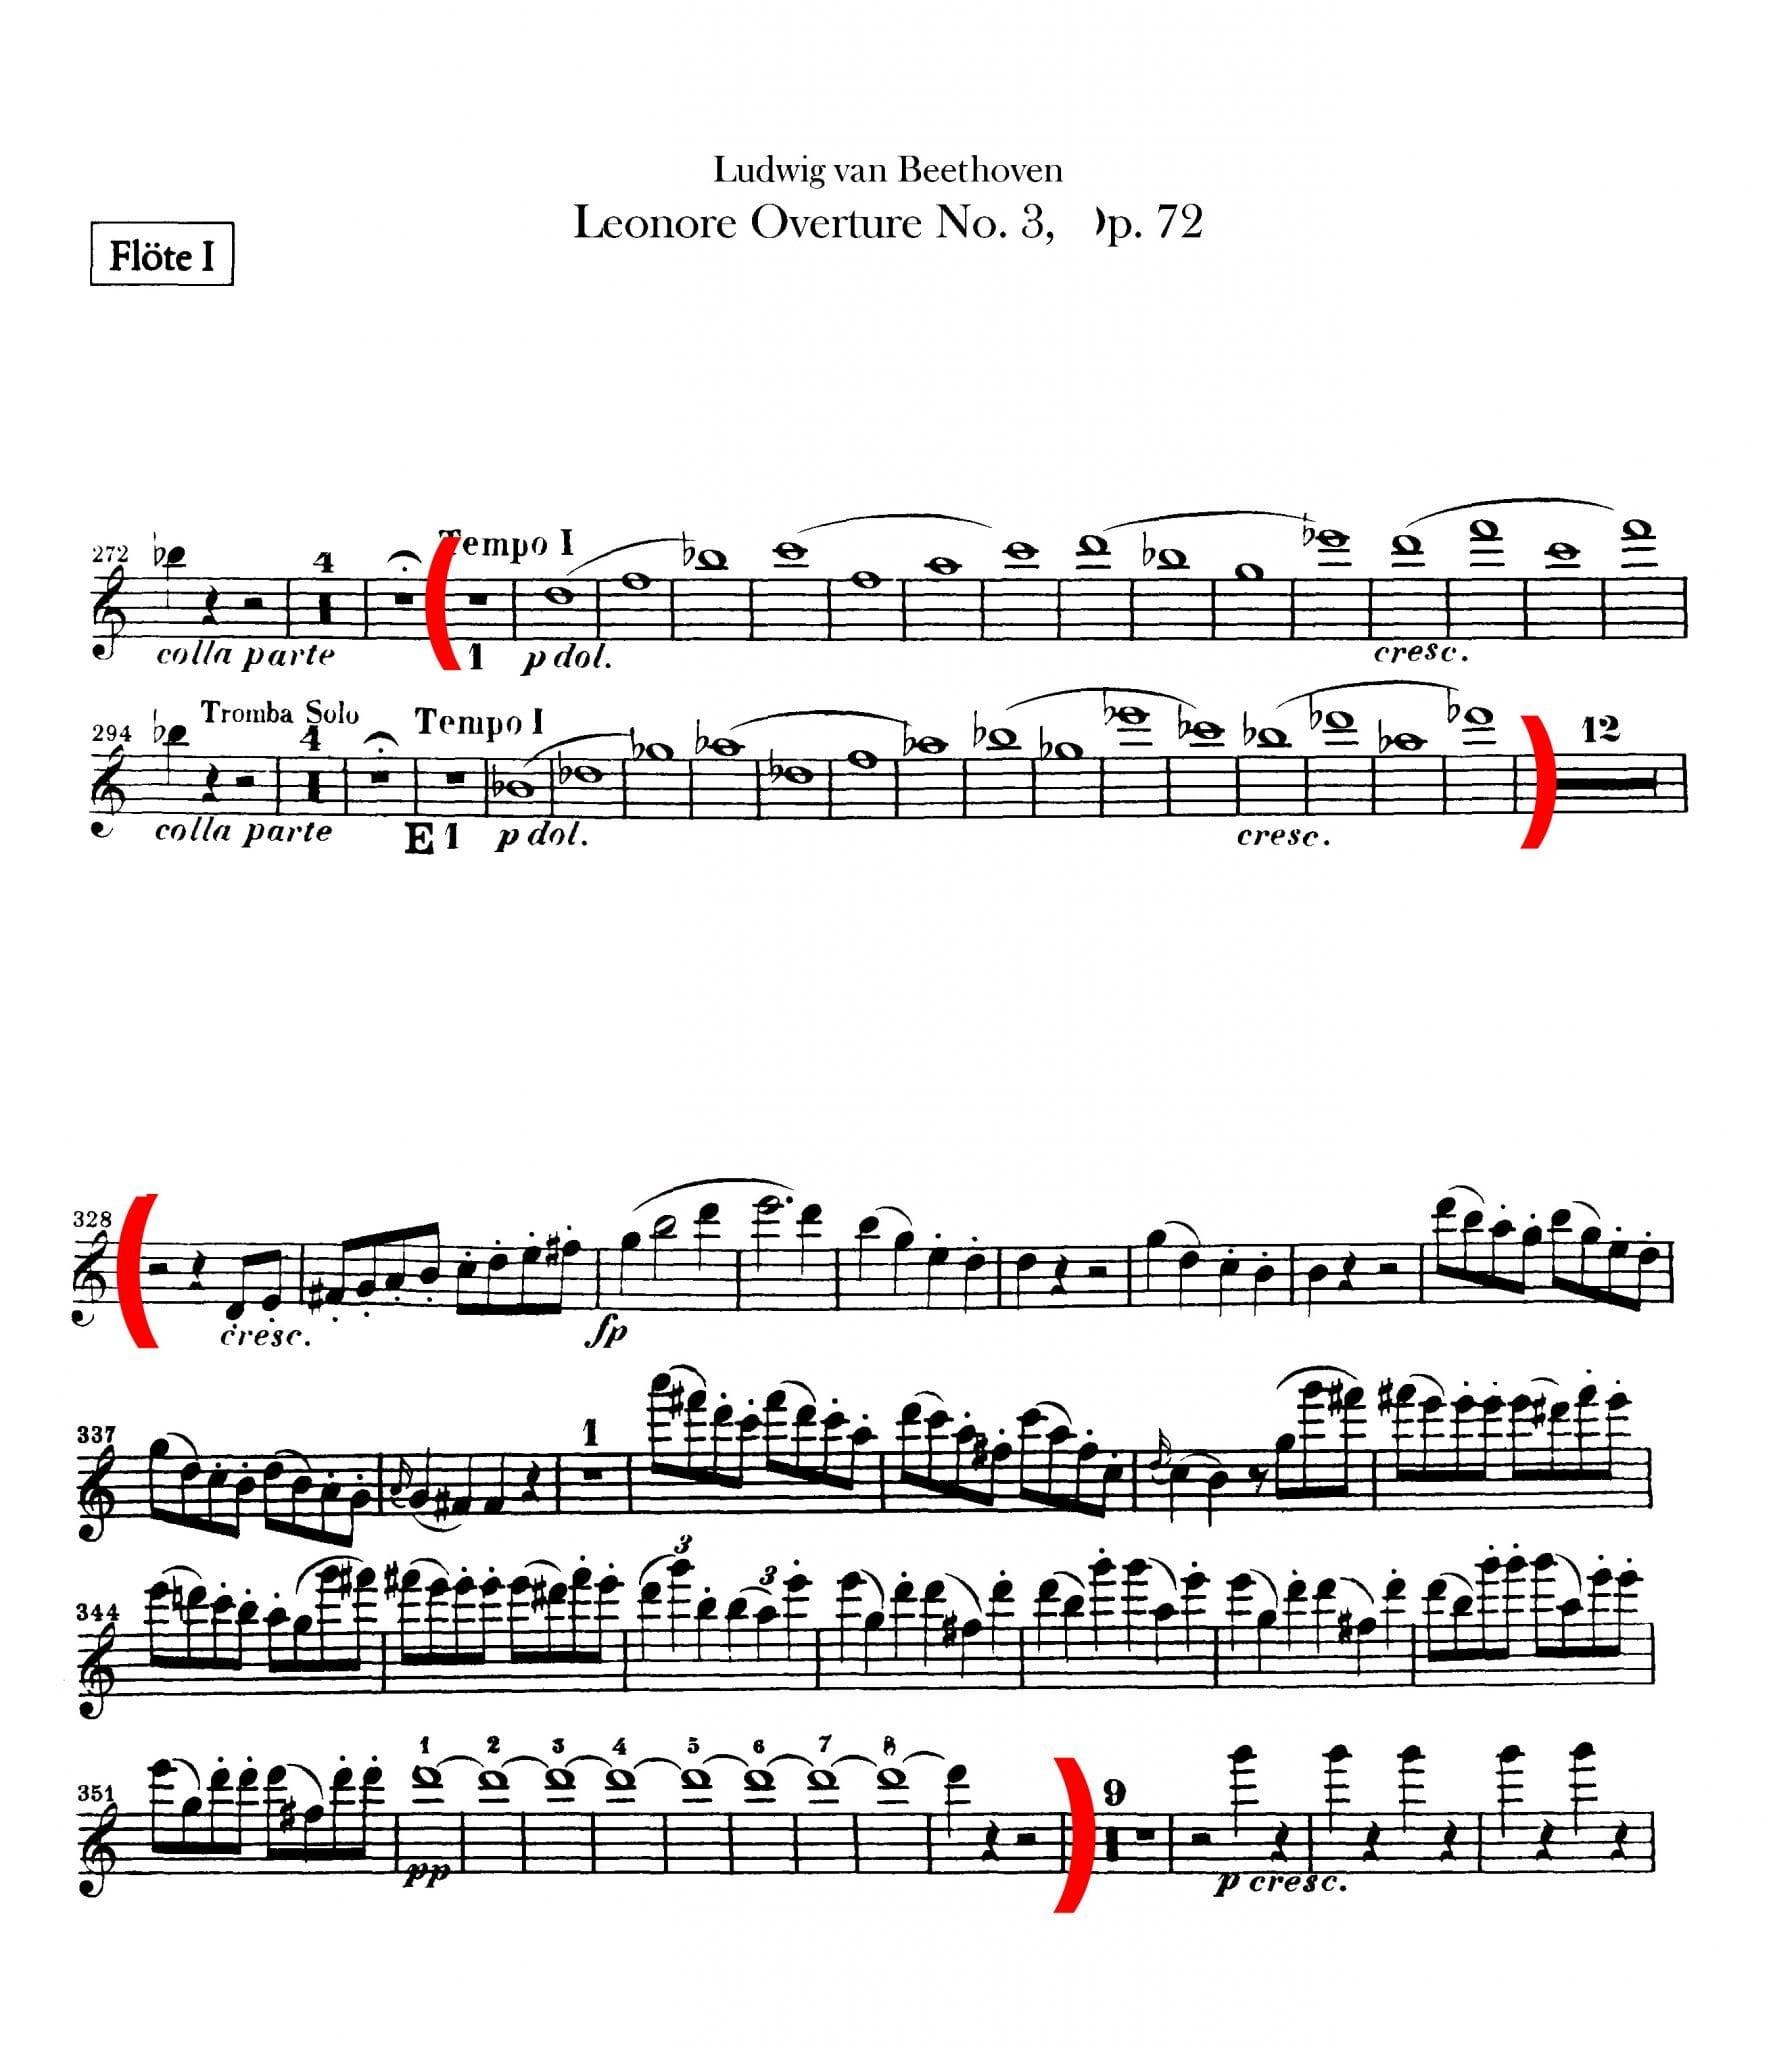 bethoven leonore overture part 2